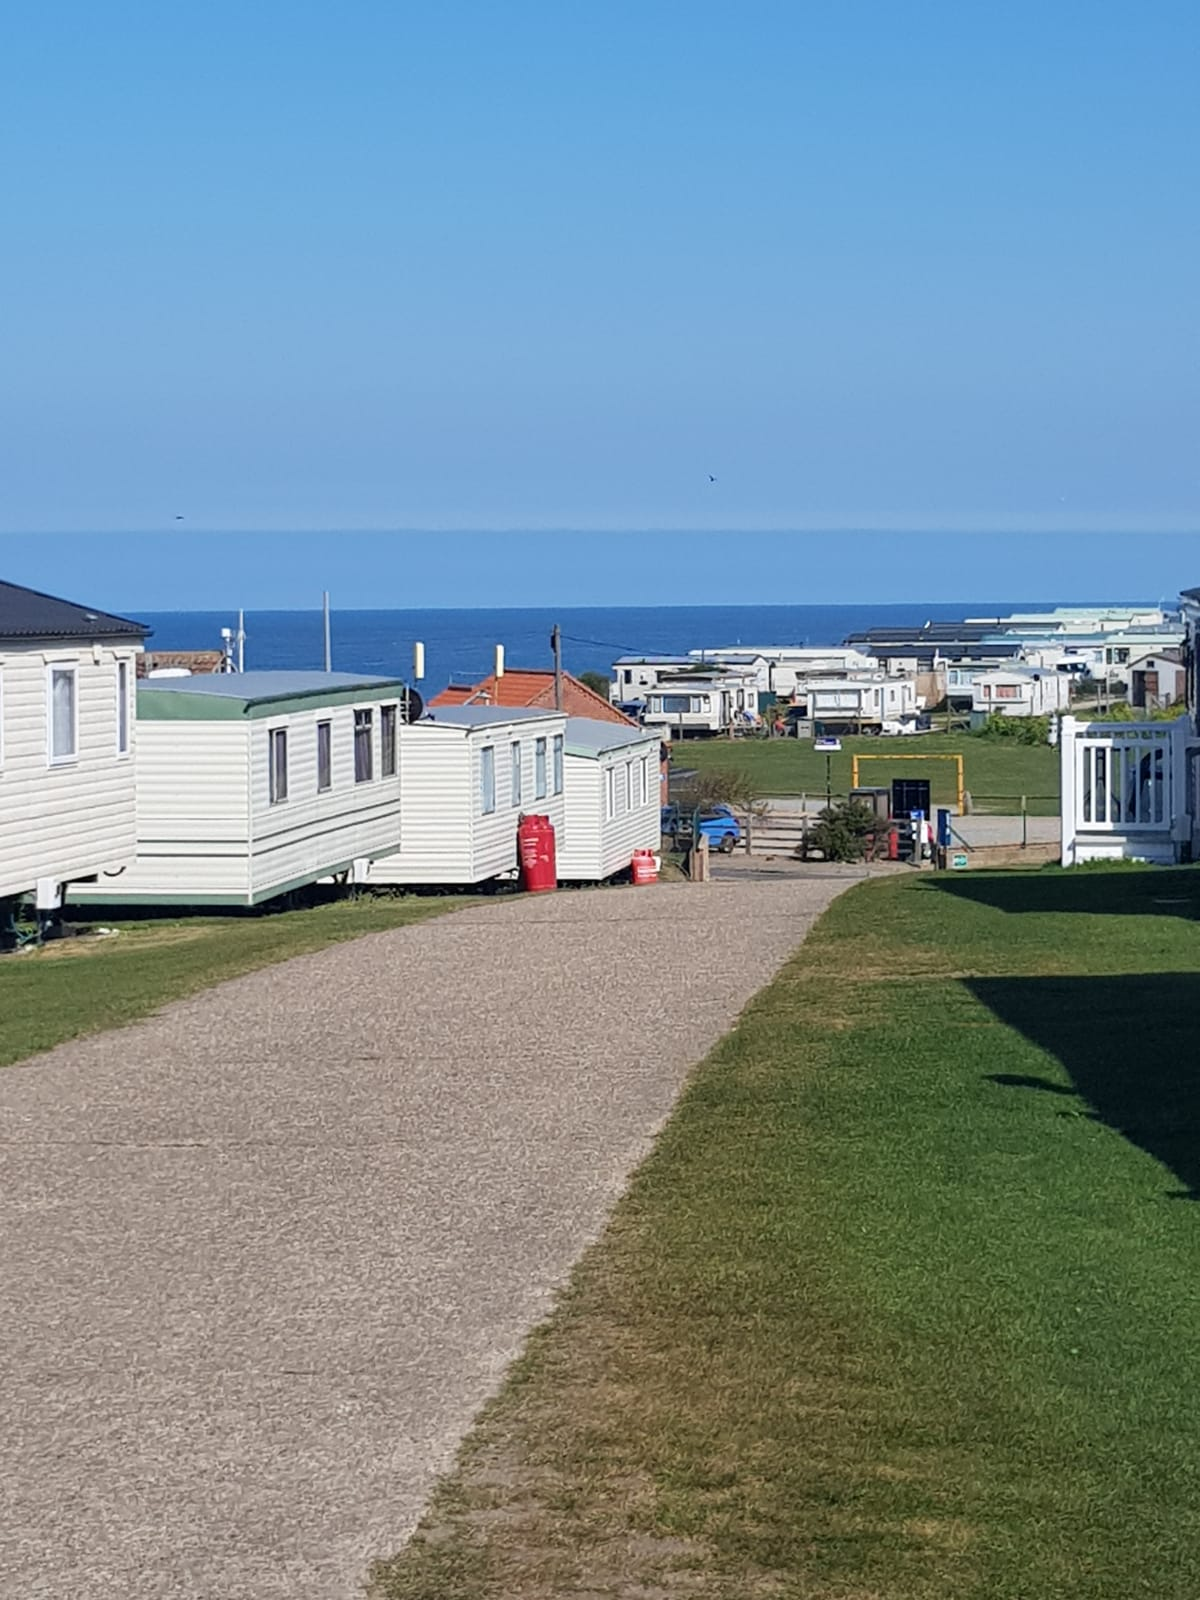 Caravan park.